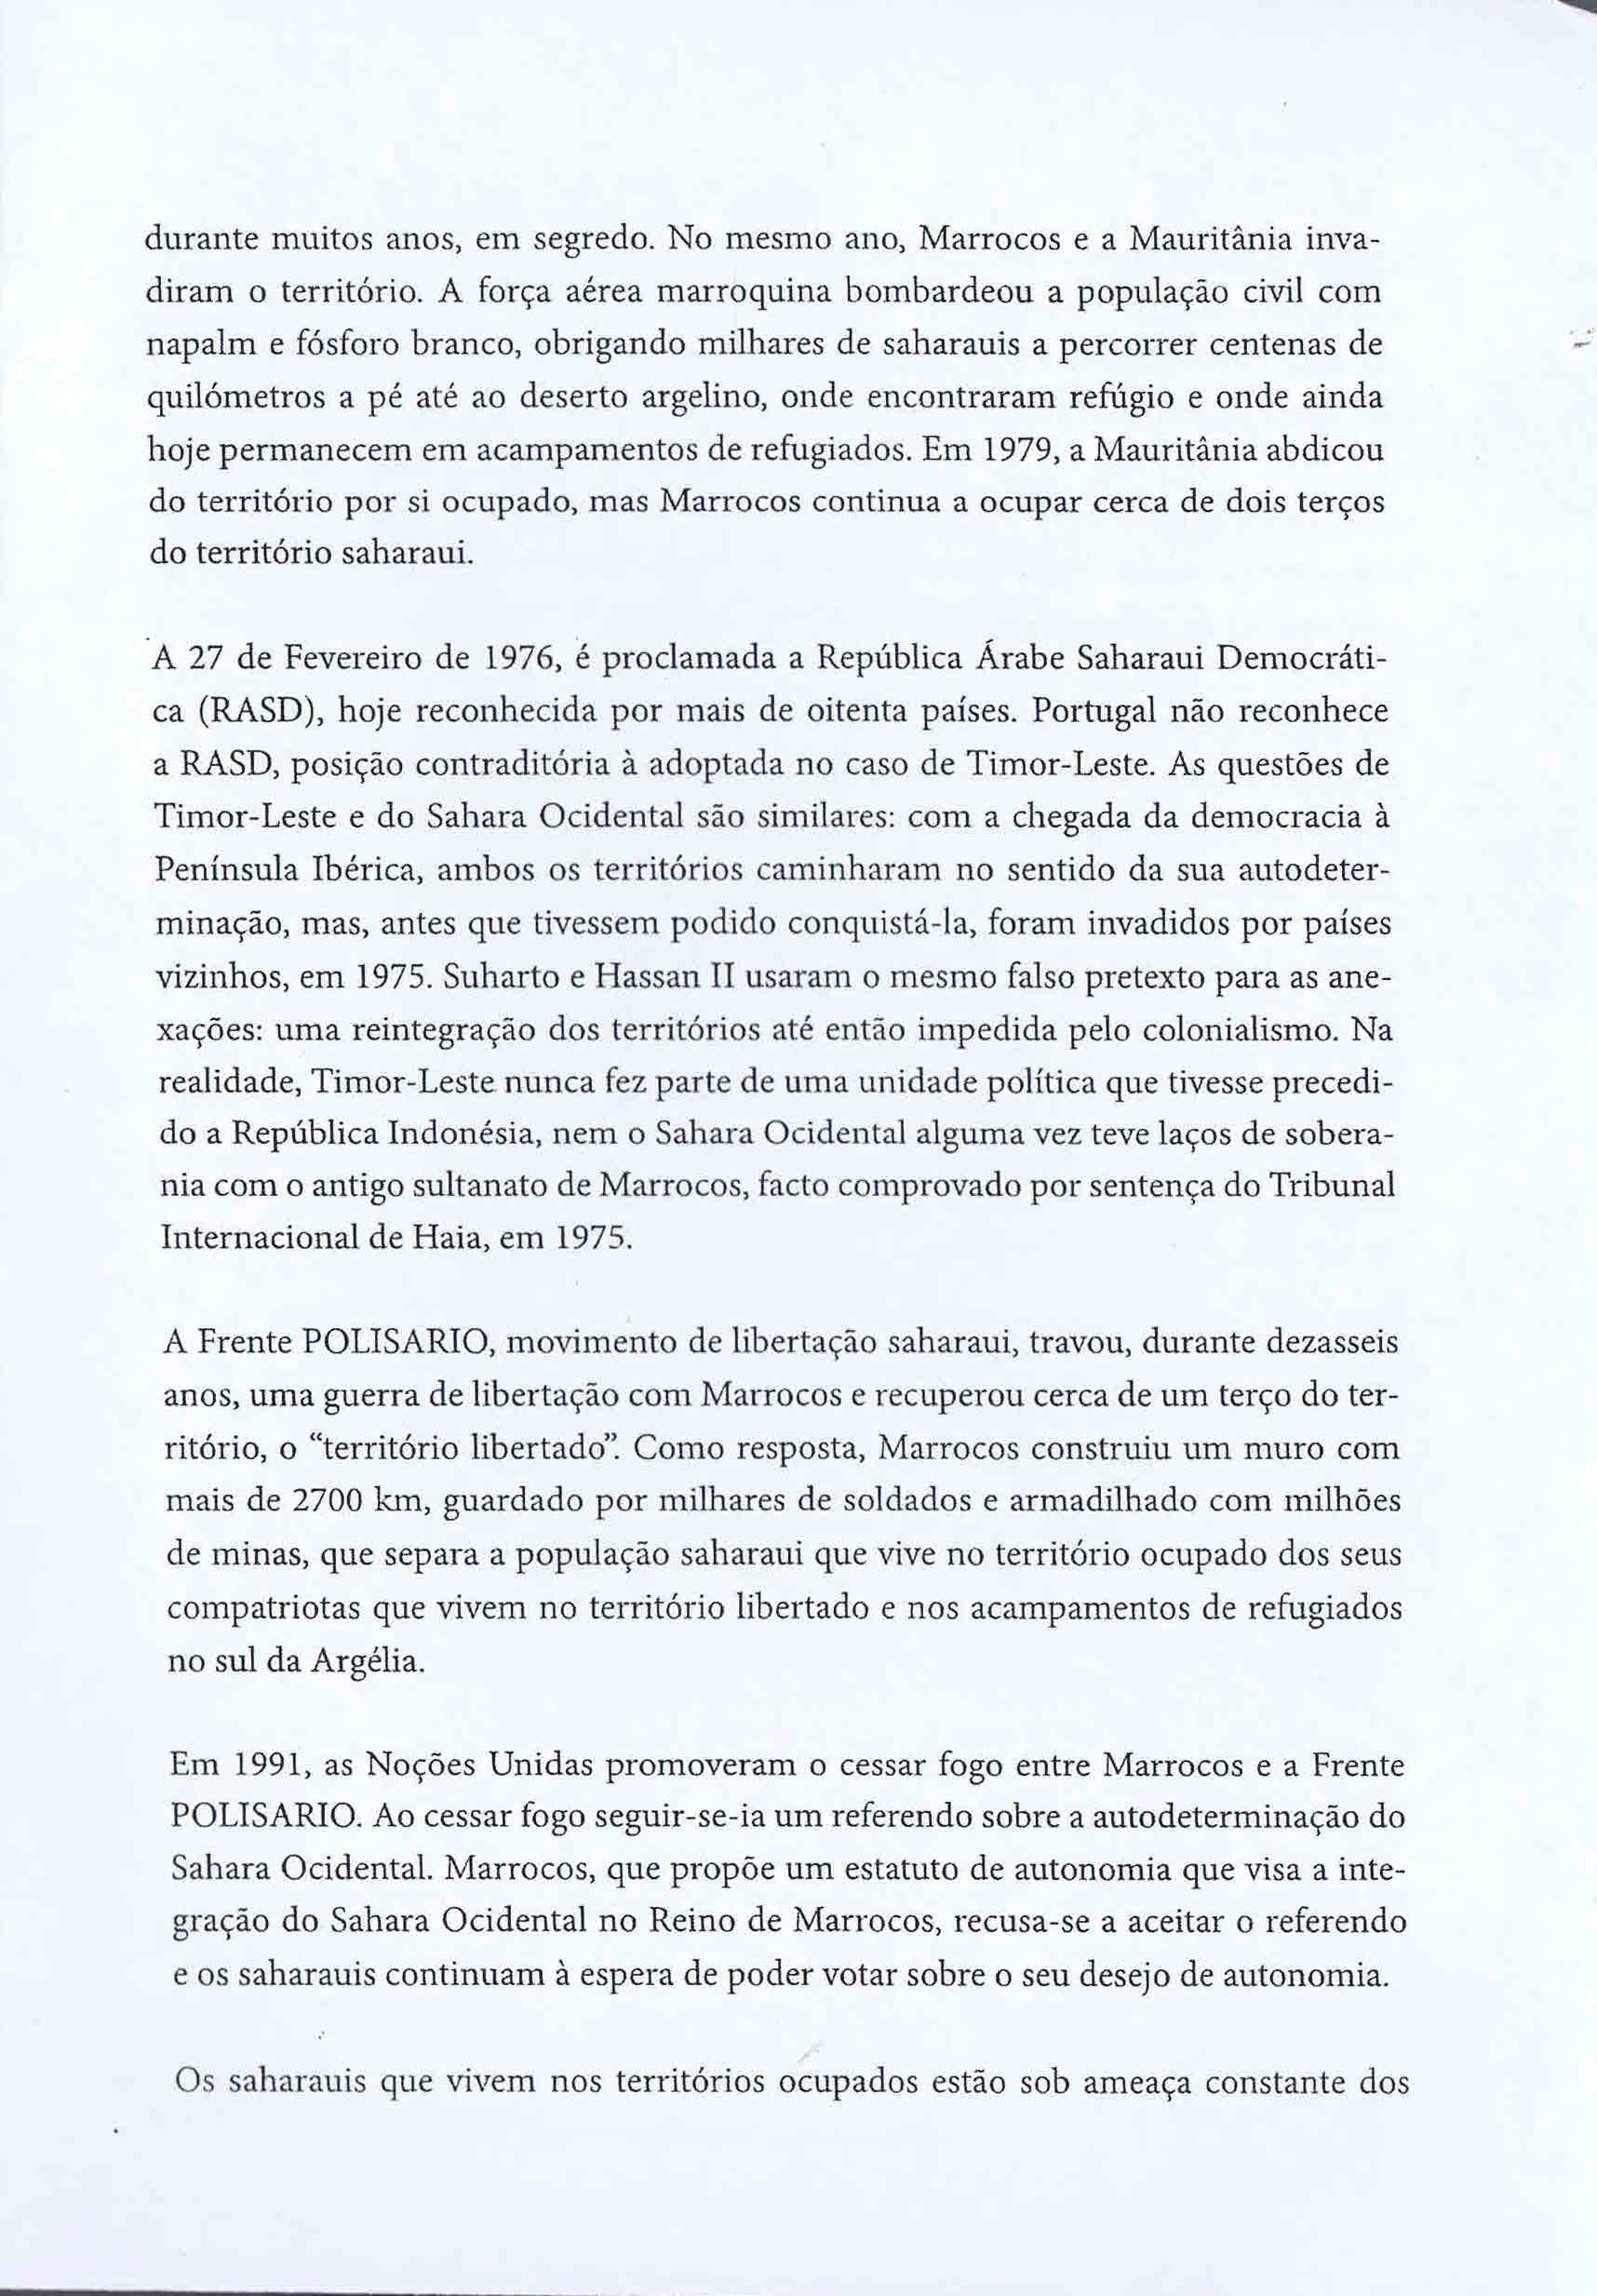 Copy of Document (101) (2)